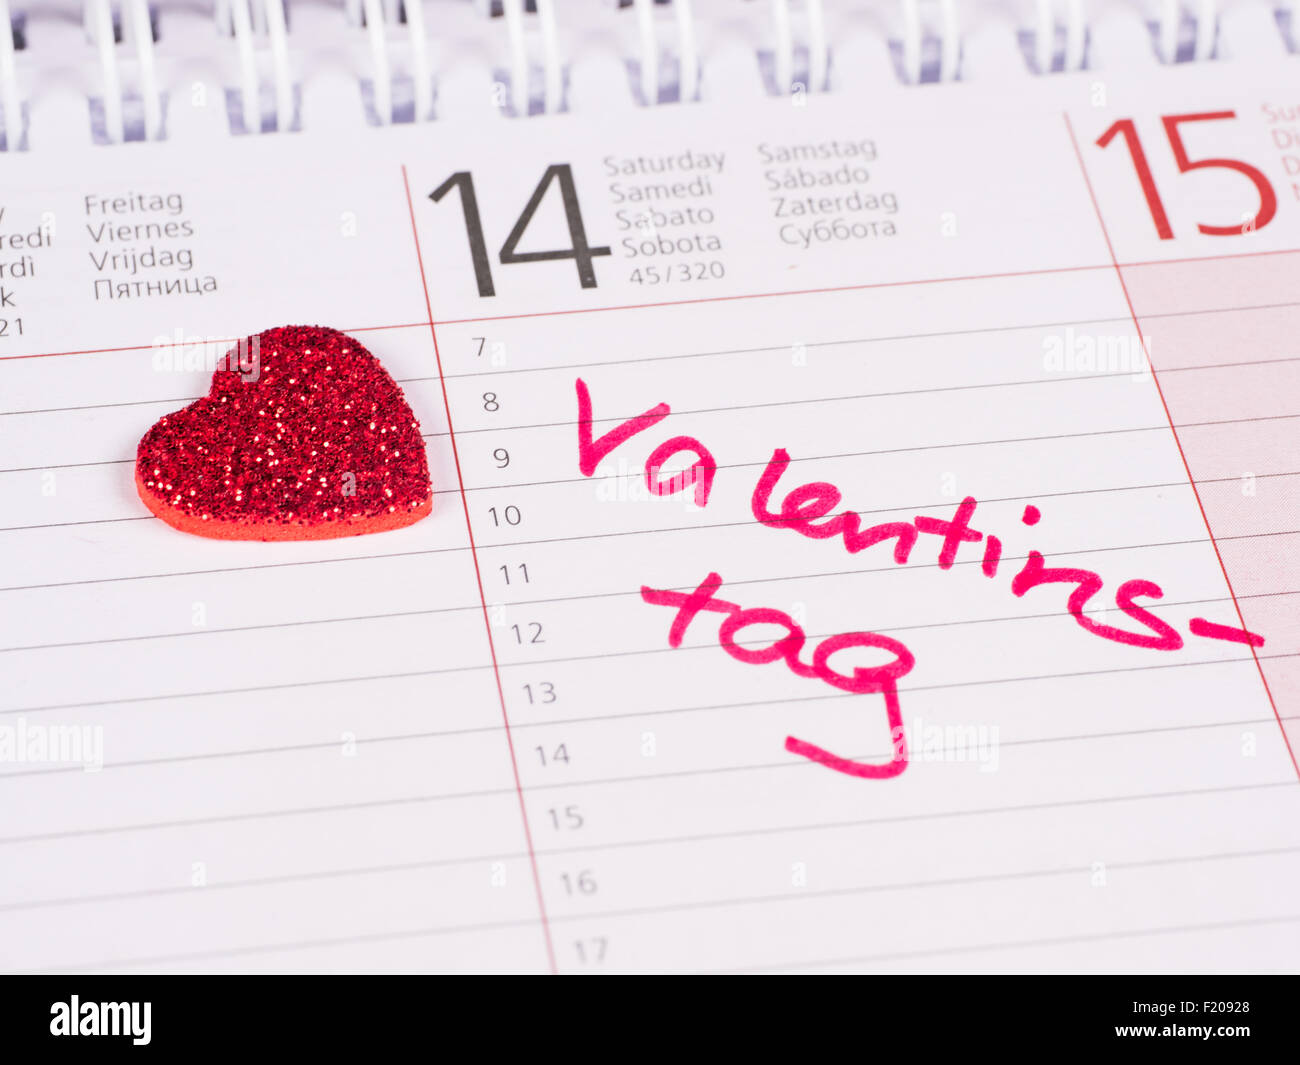 Kalendereintrag Valentinstag - Stock Image